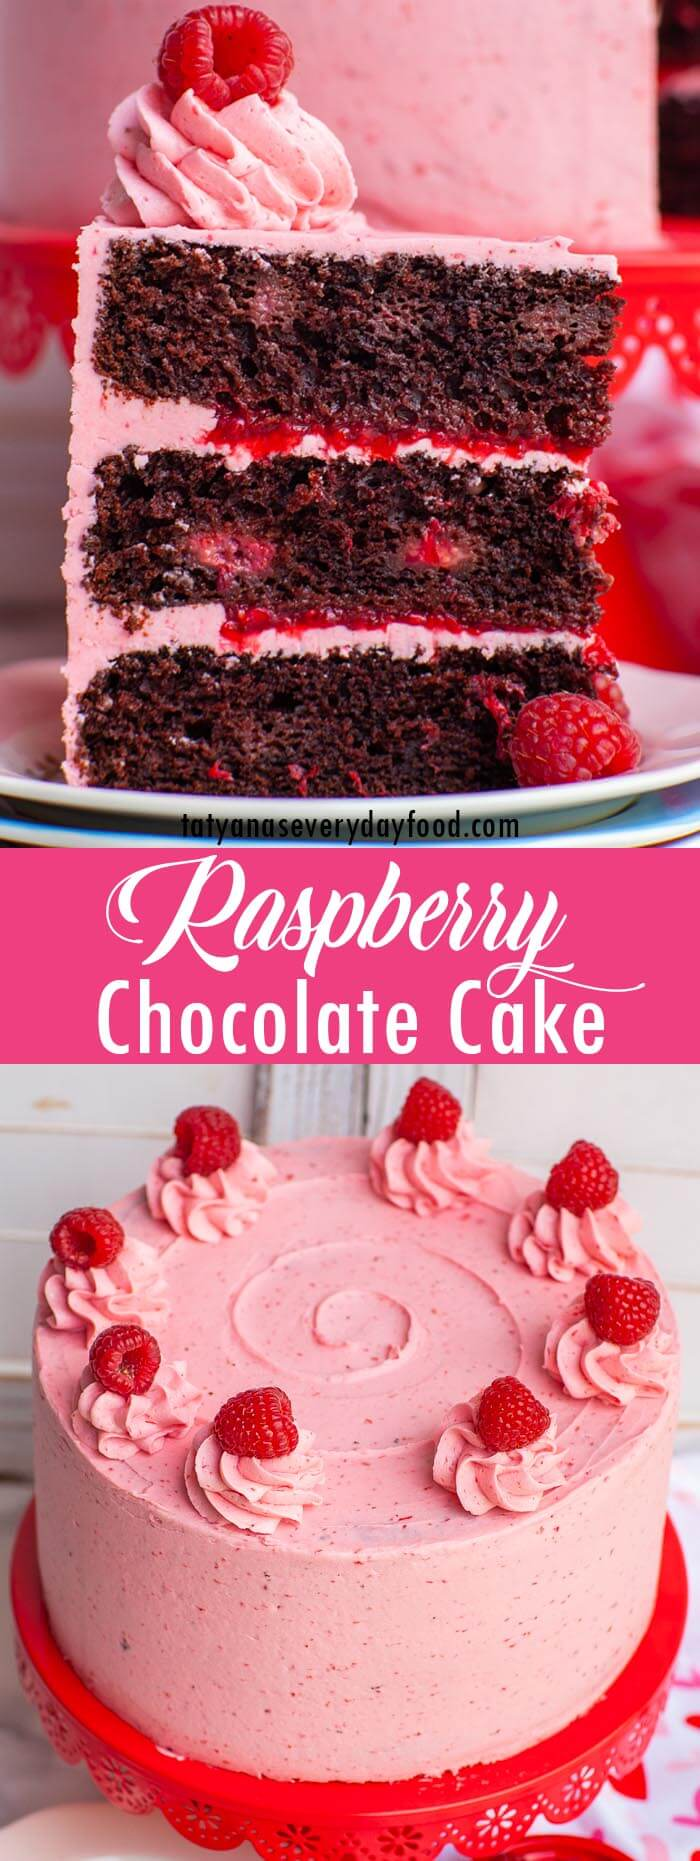 Chocolate Raspberry Cake video recipe